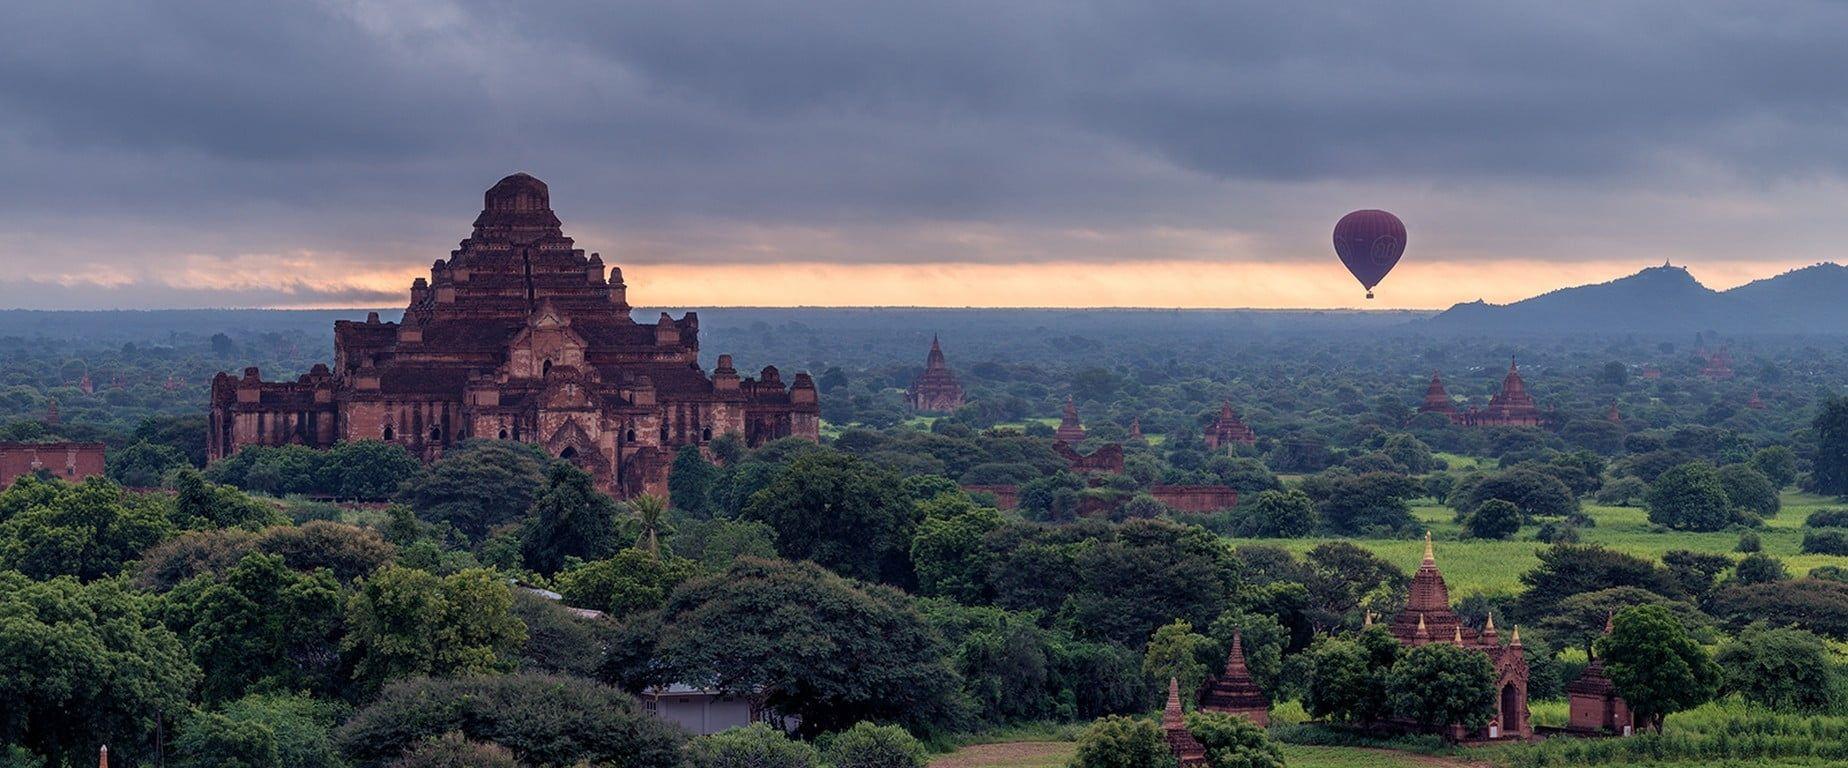 brown hot air balloon #Burma hot air balloons #Bagan #720P #wallpaper #hdwallpaper #desktop